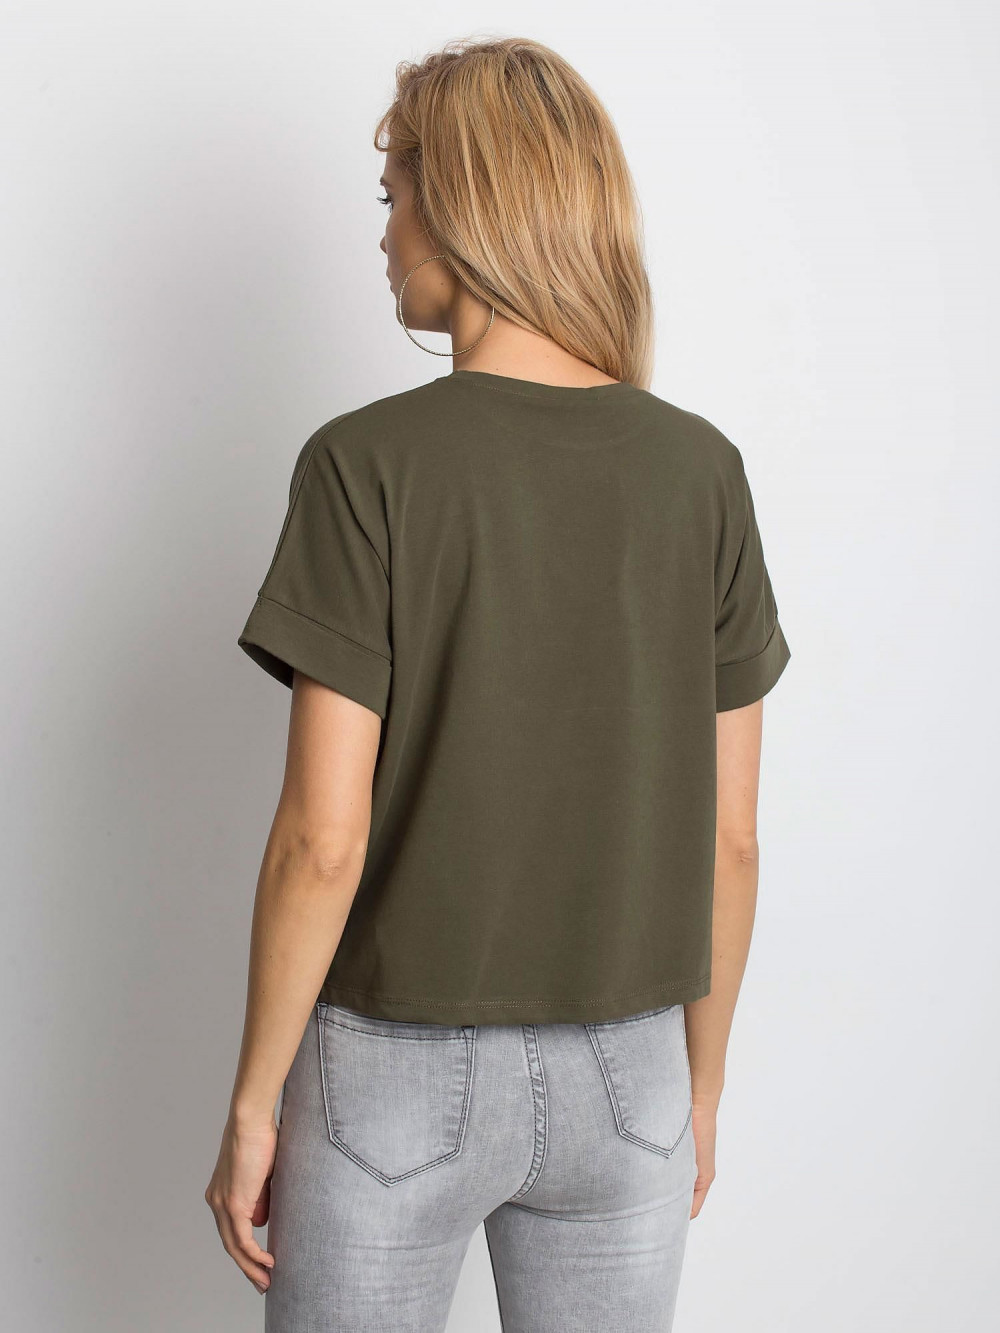 Khaki luźny t-shirt Blink 4